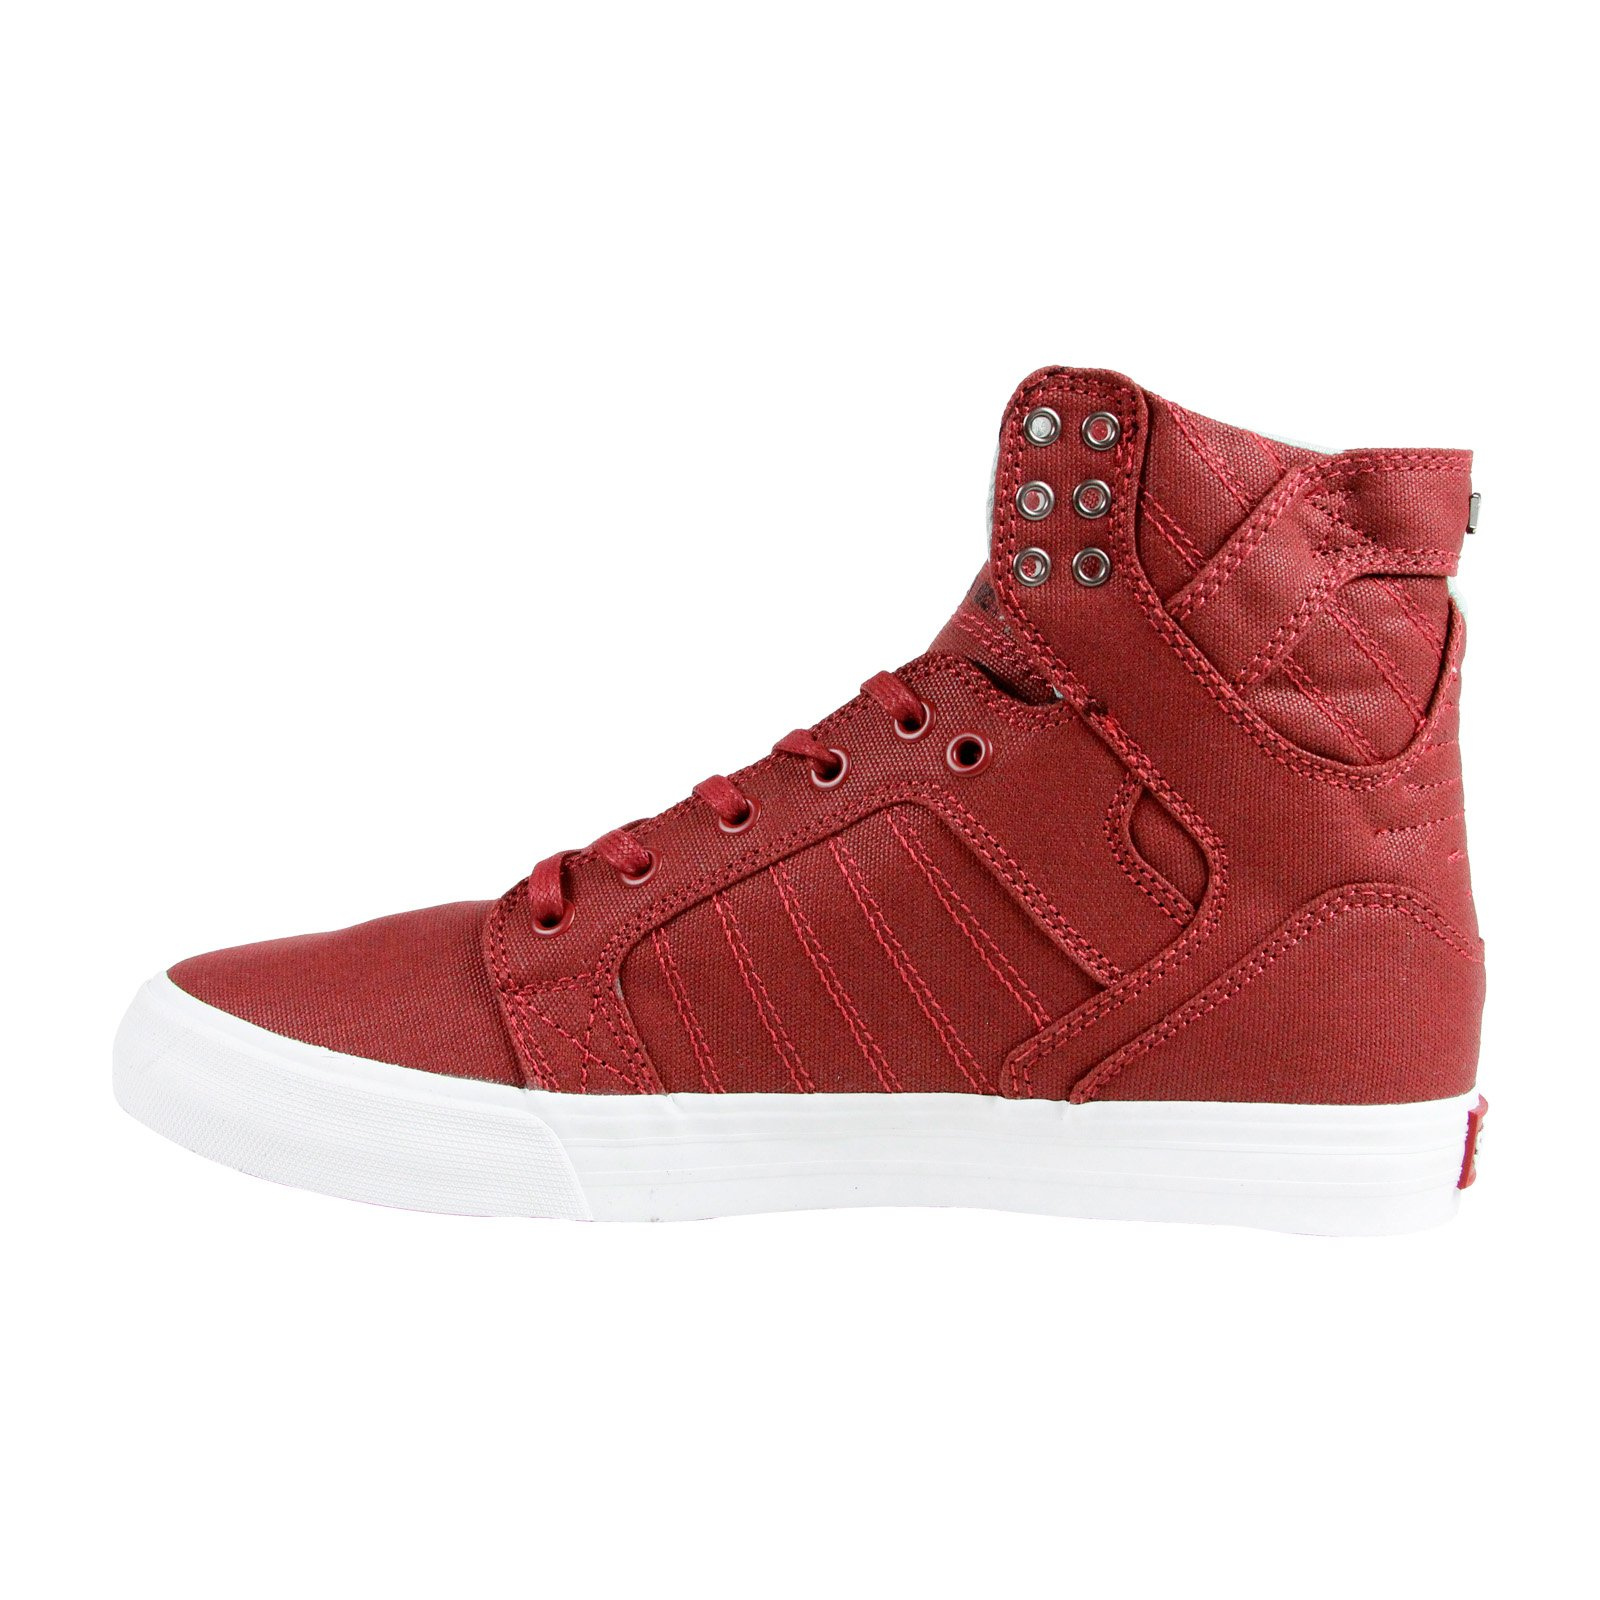 Supra Mens Skytop Shoes Size 9.5